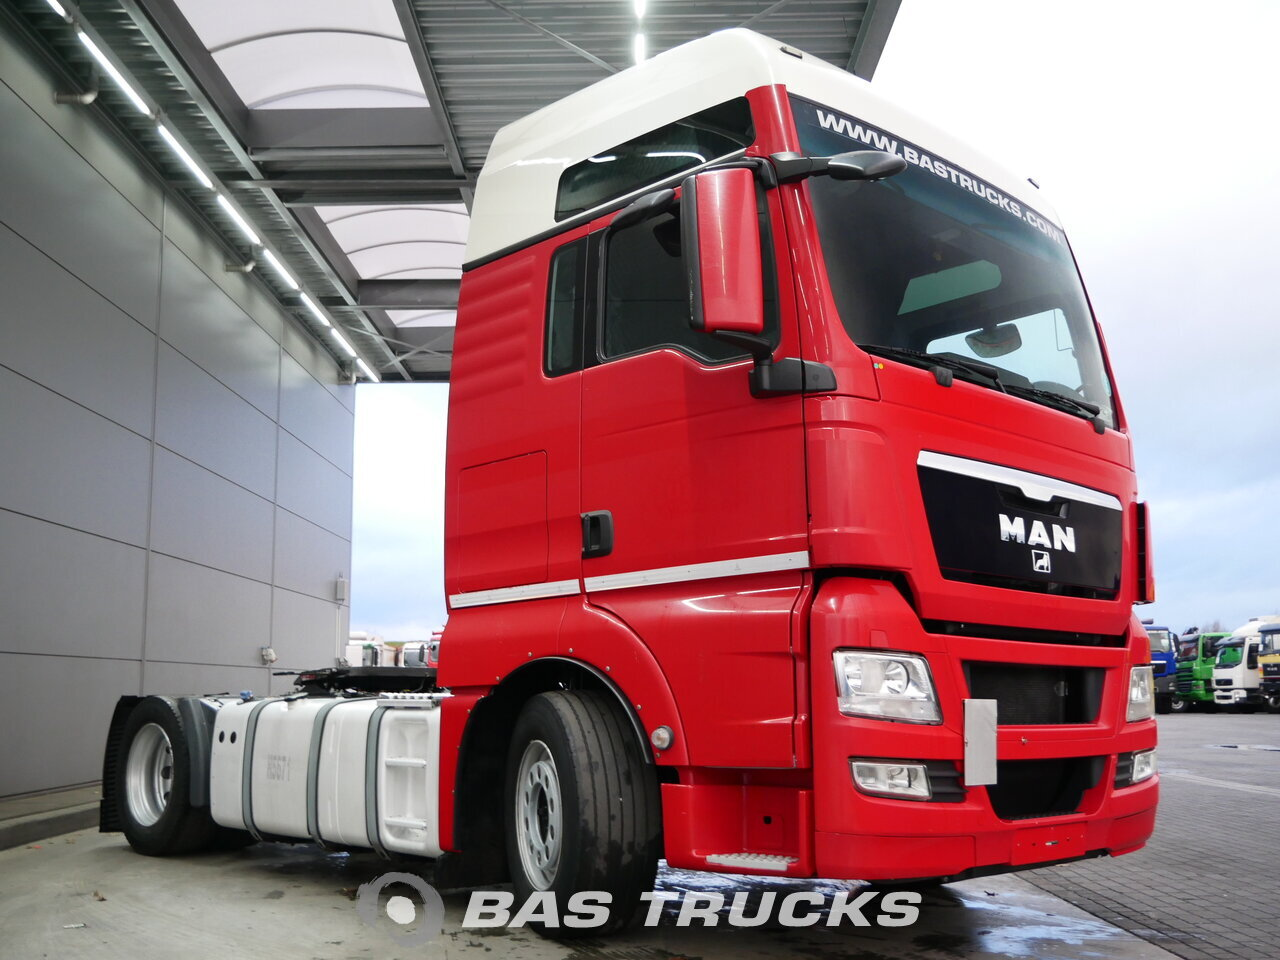 man tgx xxl tractorhead euro norm 5 20400 bas trucks. Black Bedroom Furniture Sets. Home Design Ideas